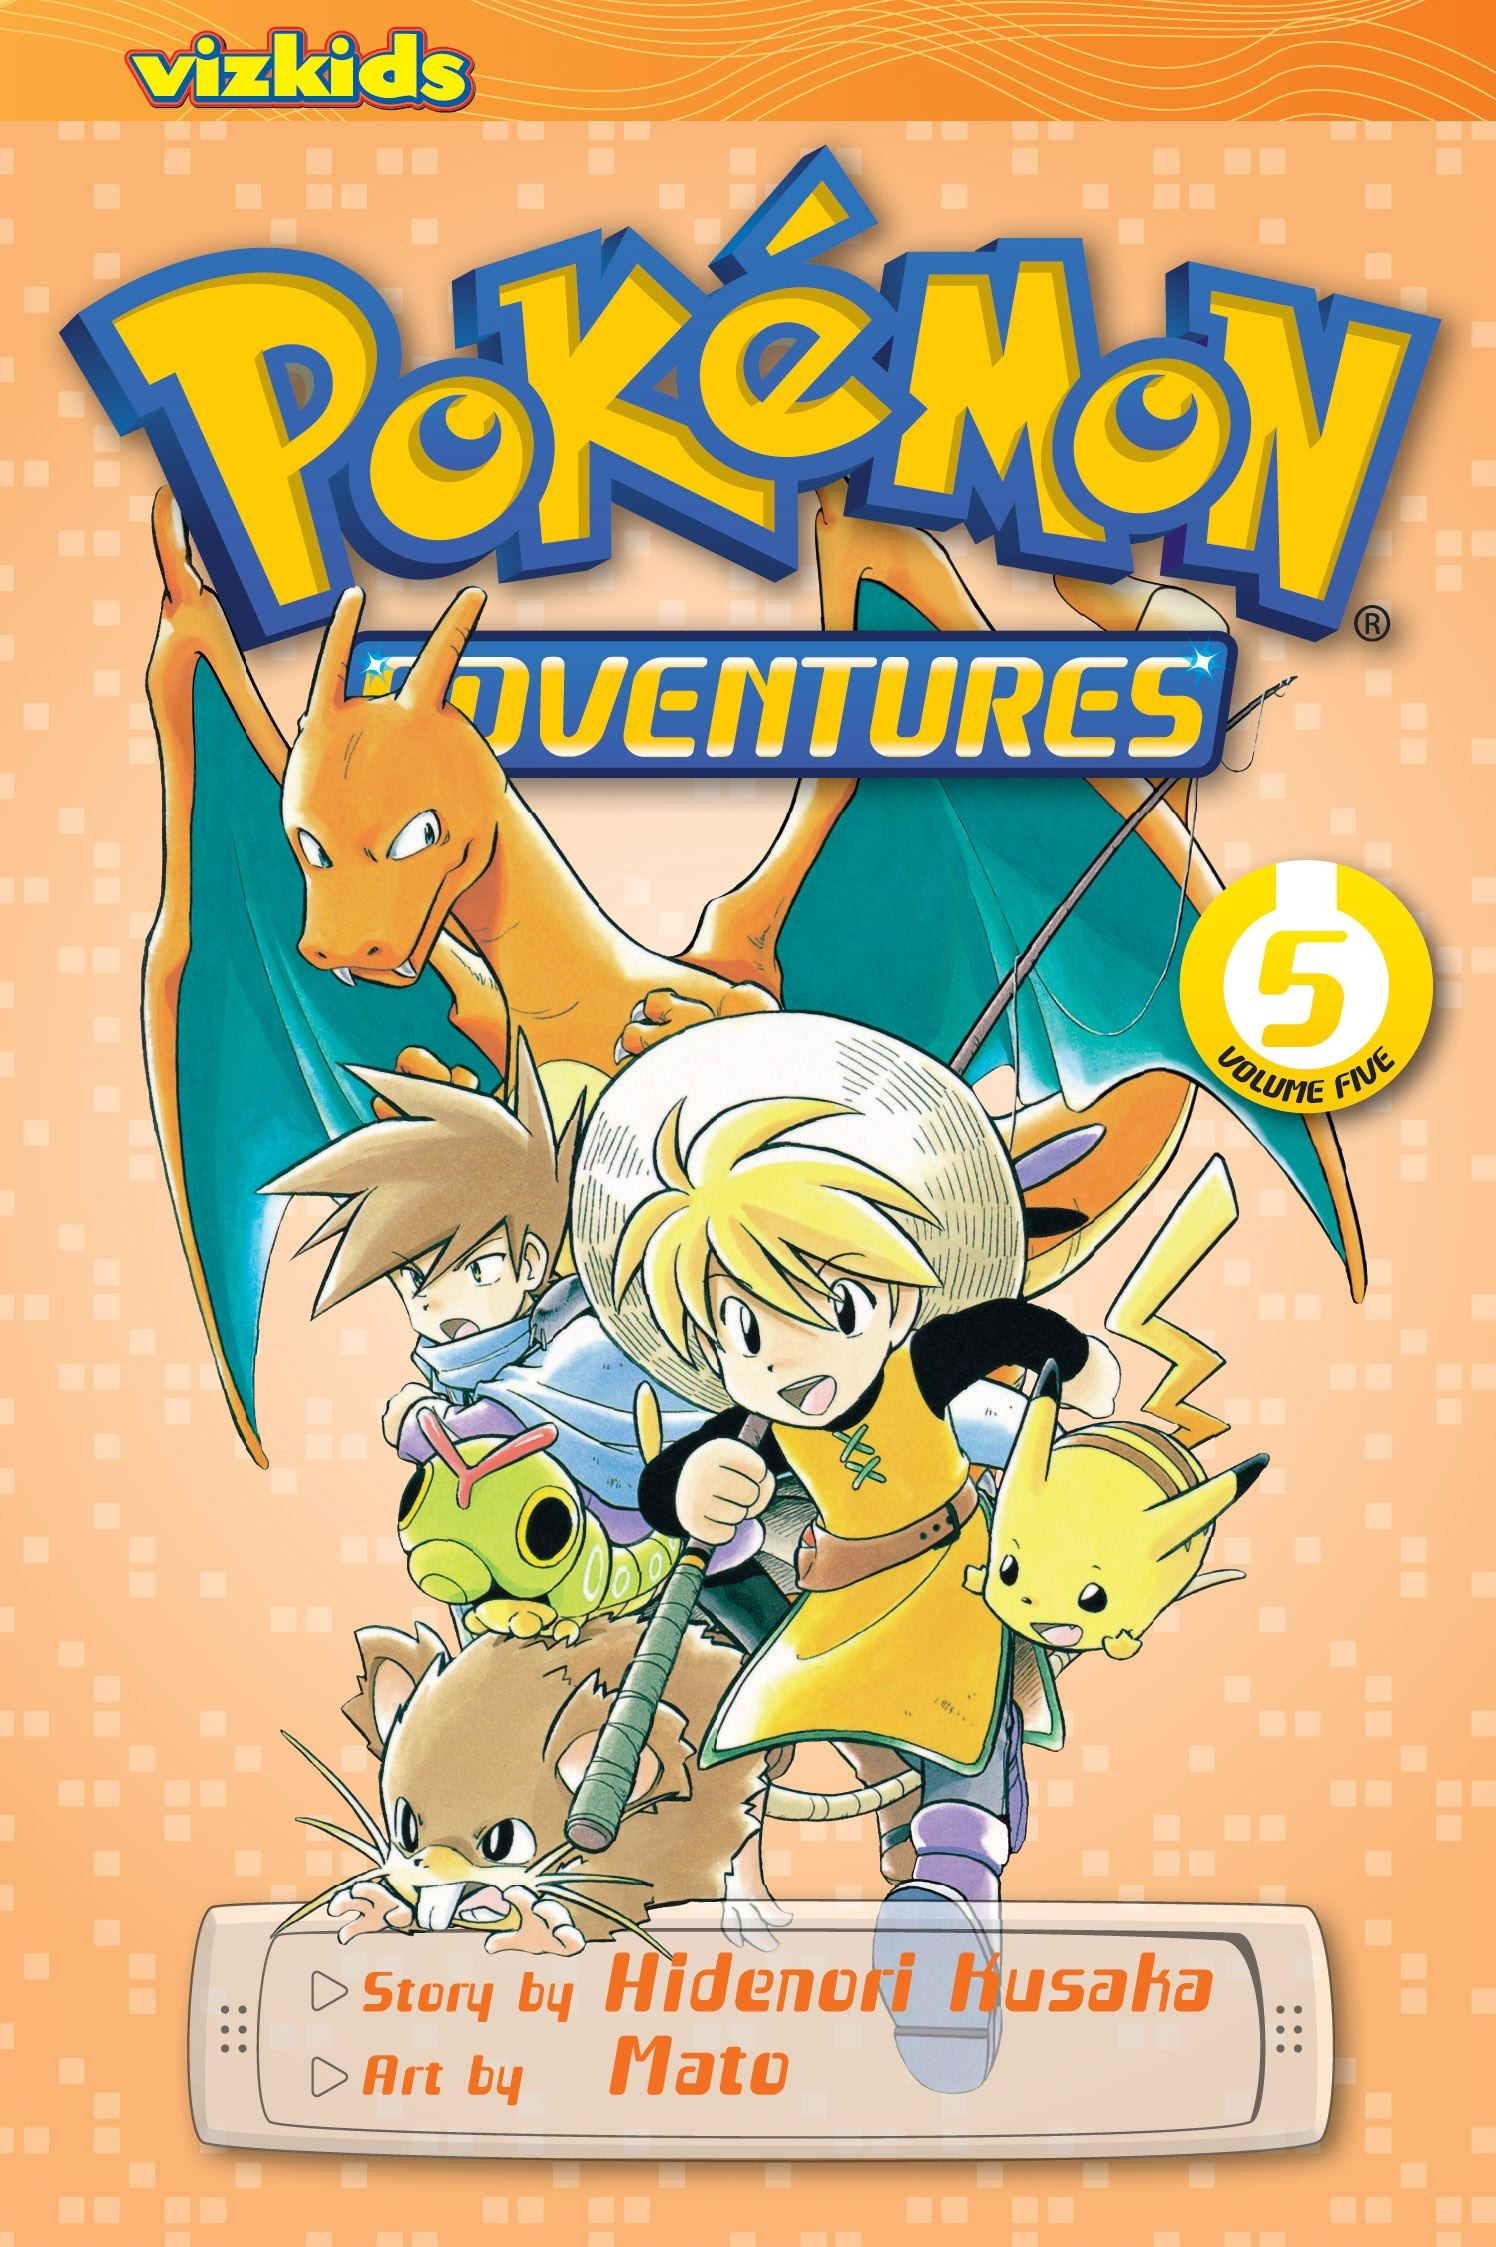 Pokémon Adventures, Vol. 5 (2nd Edition) by Hidenori Kusaka